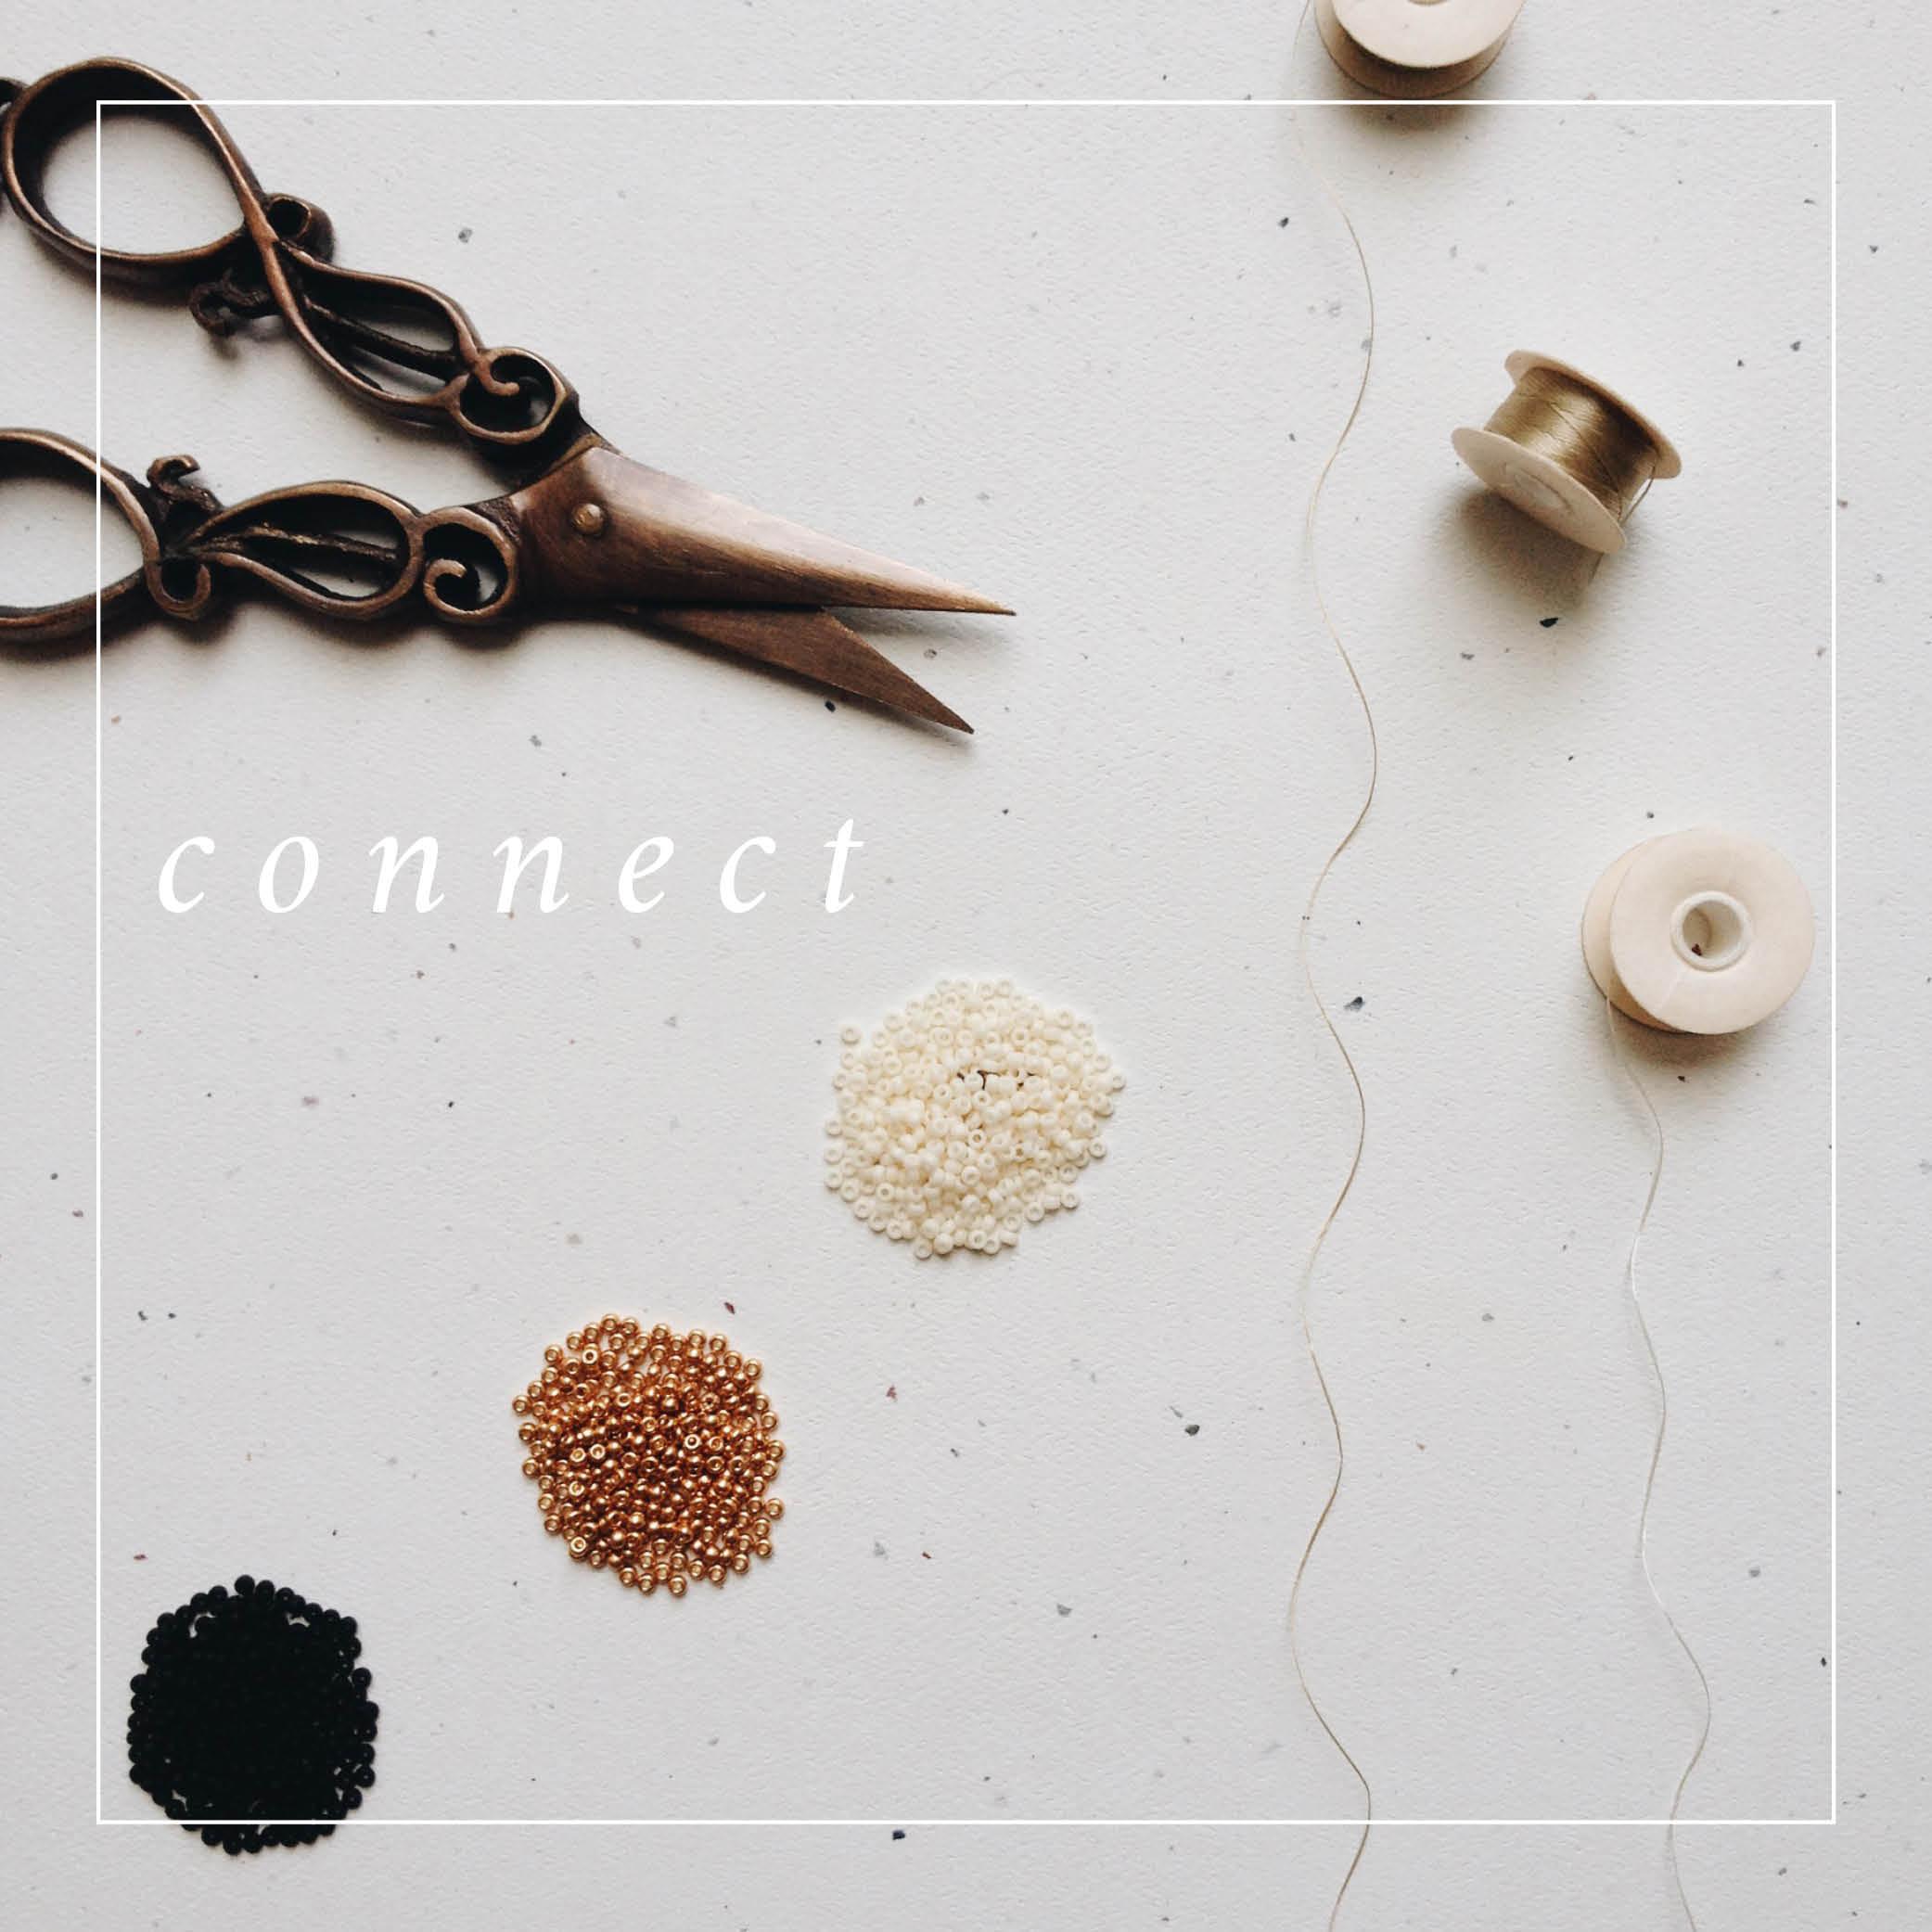 connect2.jpg